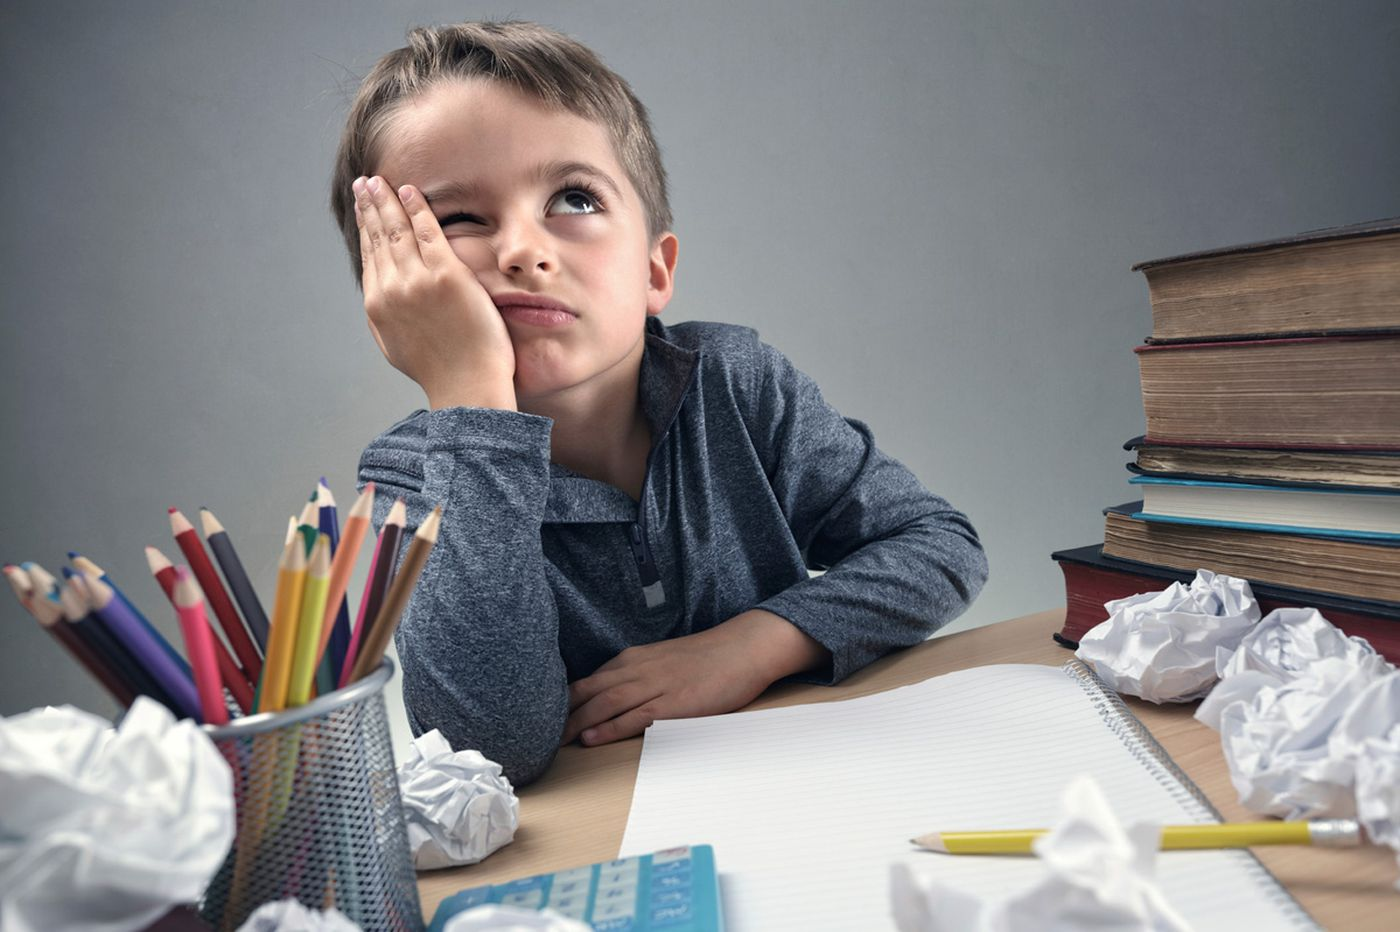 5 strategies to motivate kids to do their homework